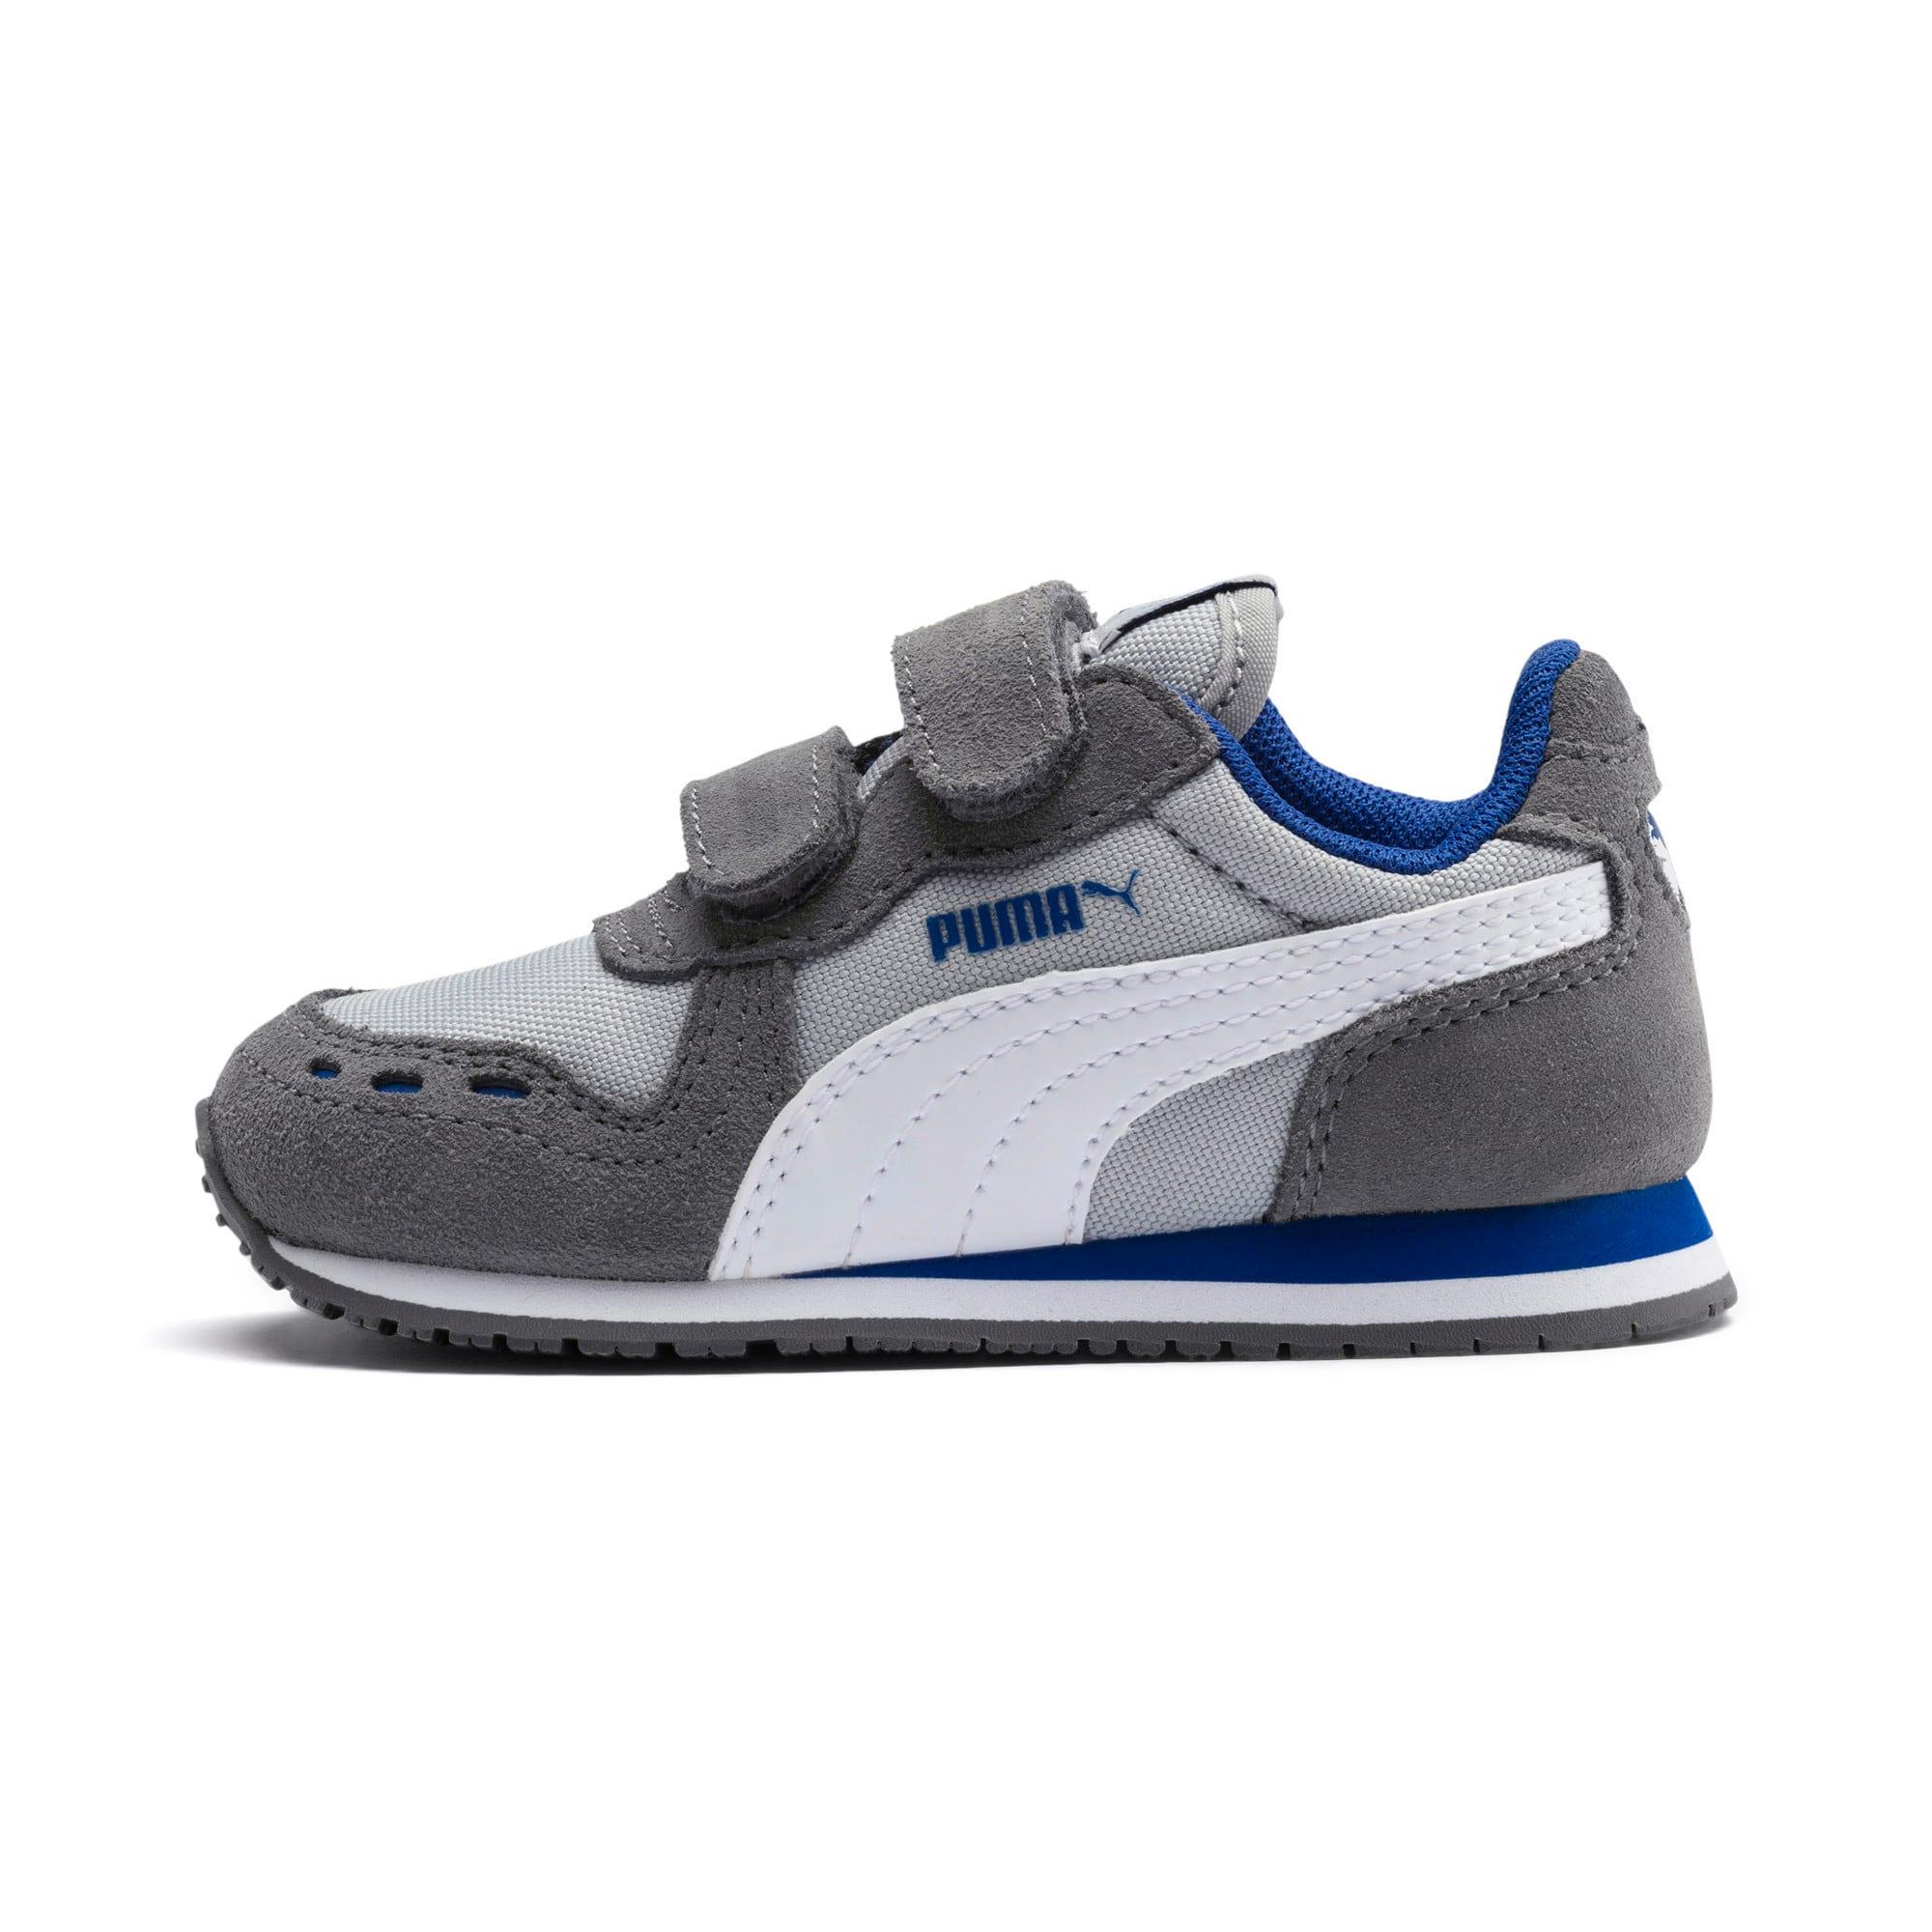 Thumbnail 1 of Cabana Racer Toddler Shoes, High Rise-CASTLEROCK, medium